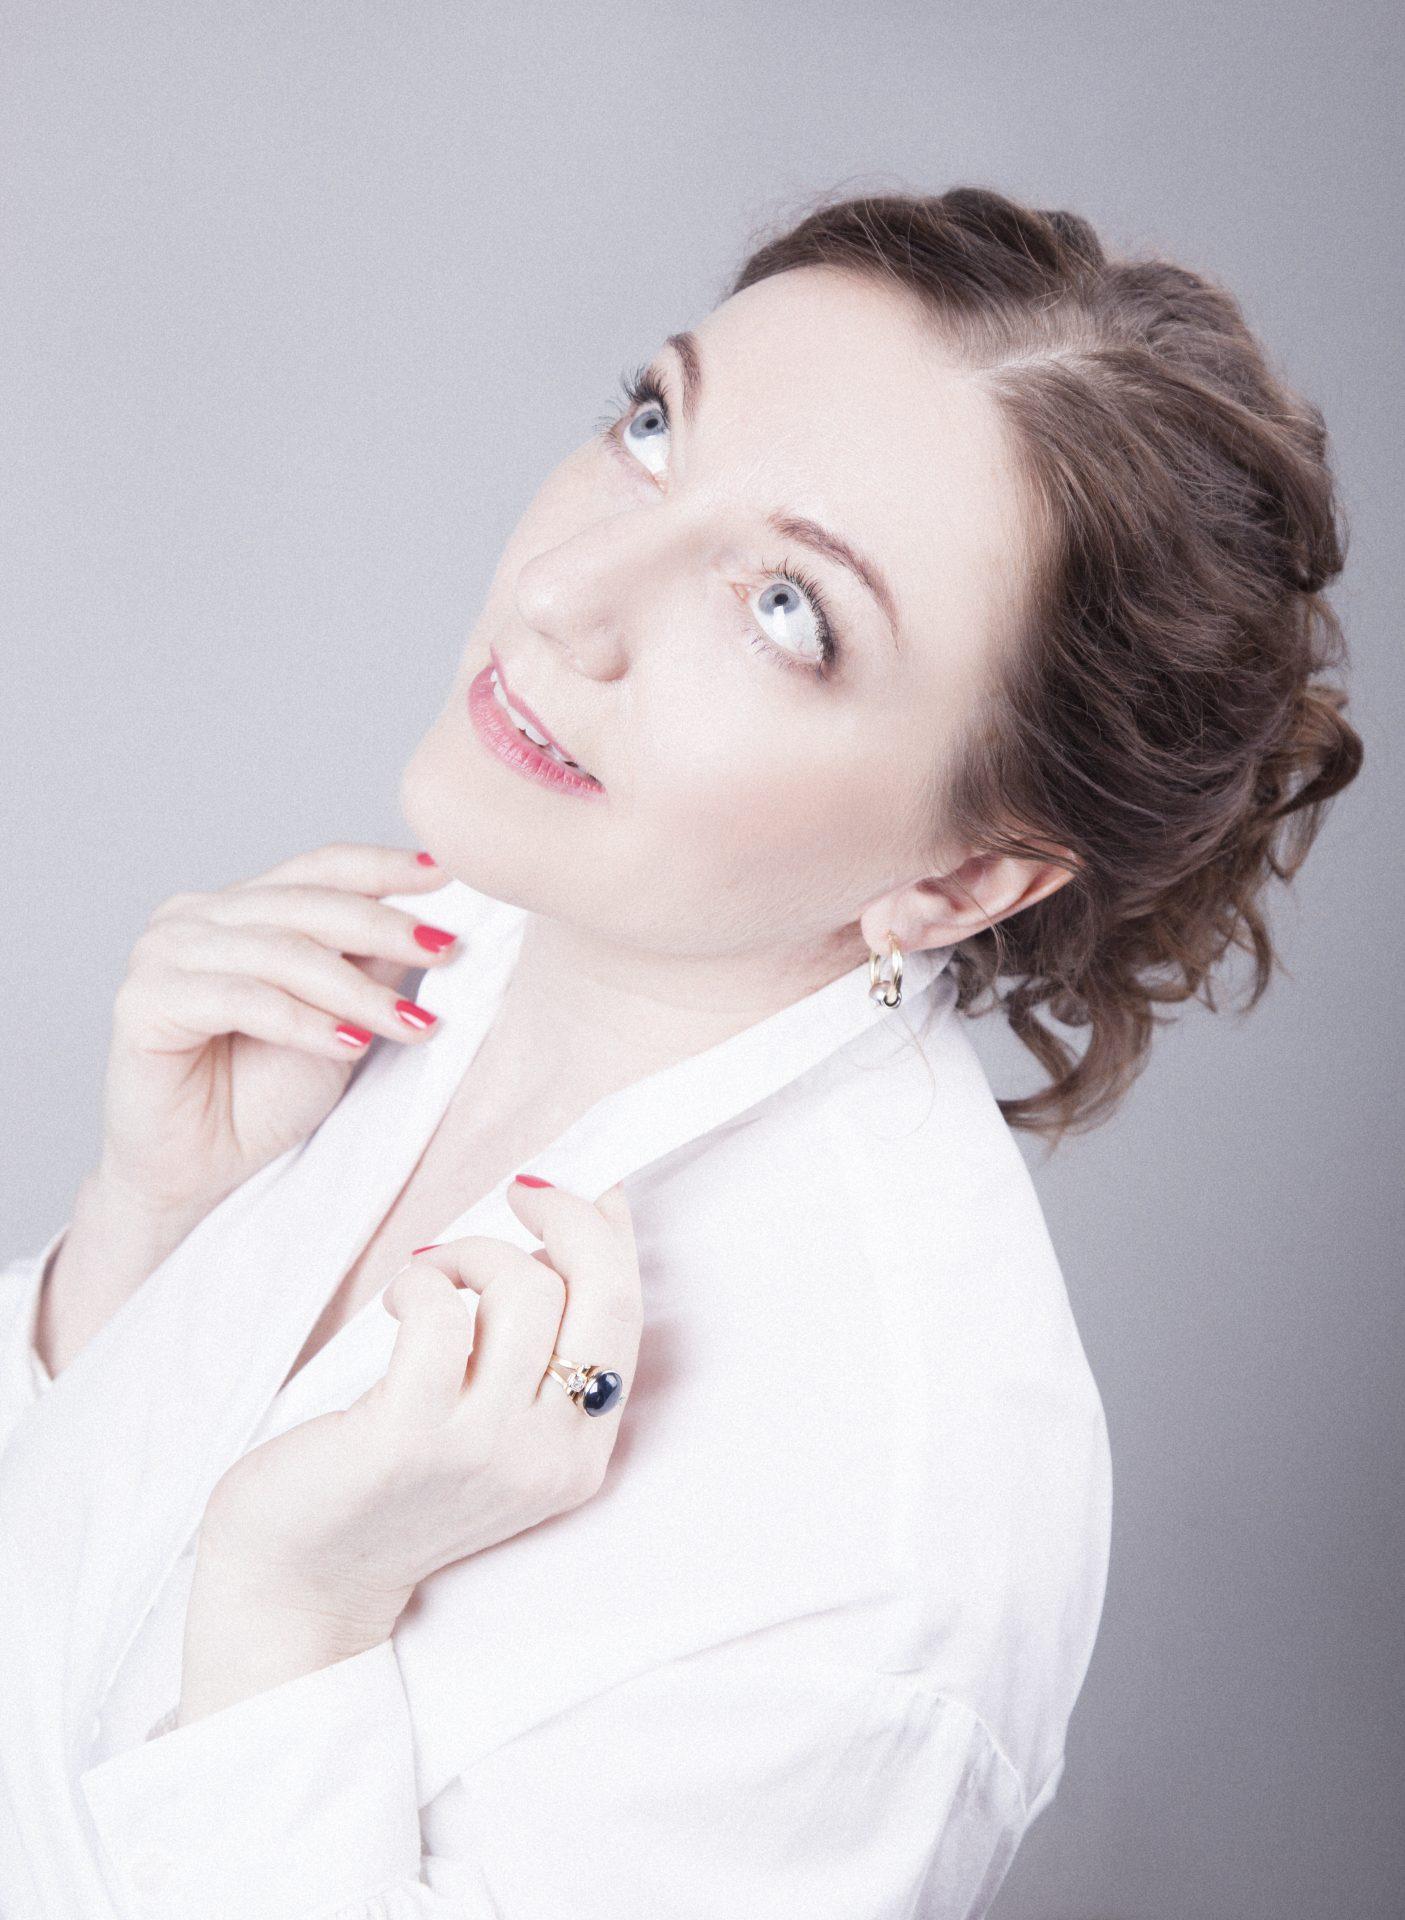 Элена Приедеслайпа. Anti-age медицина 2